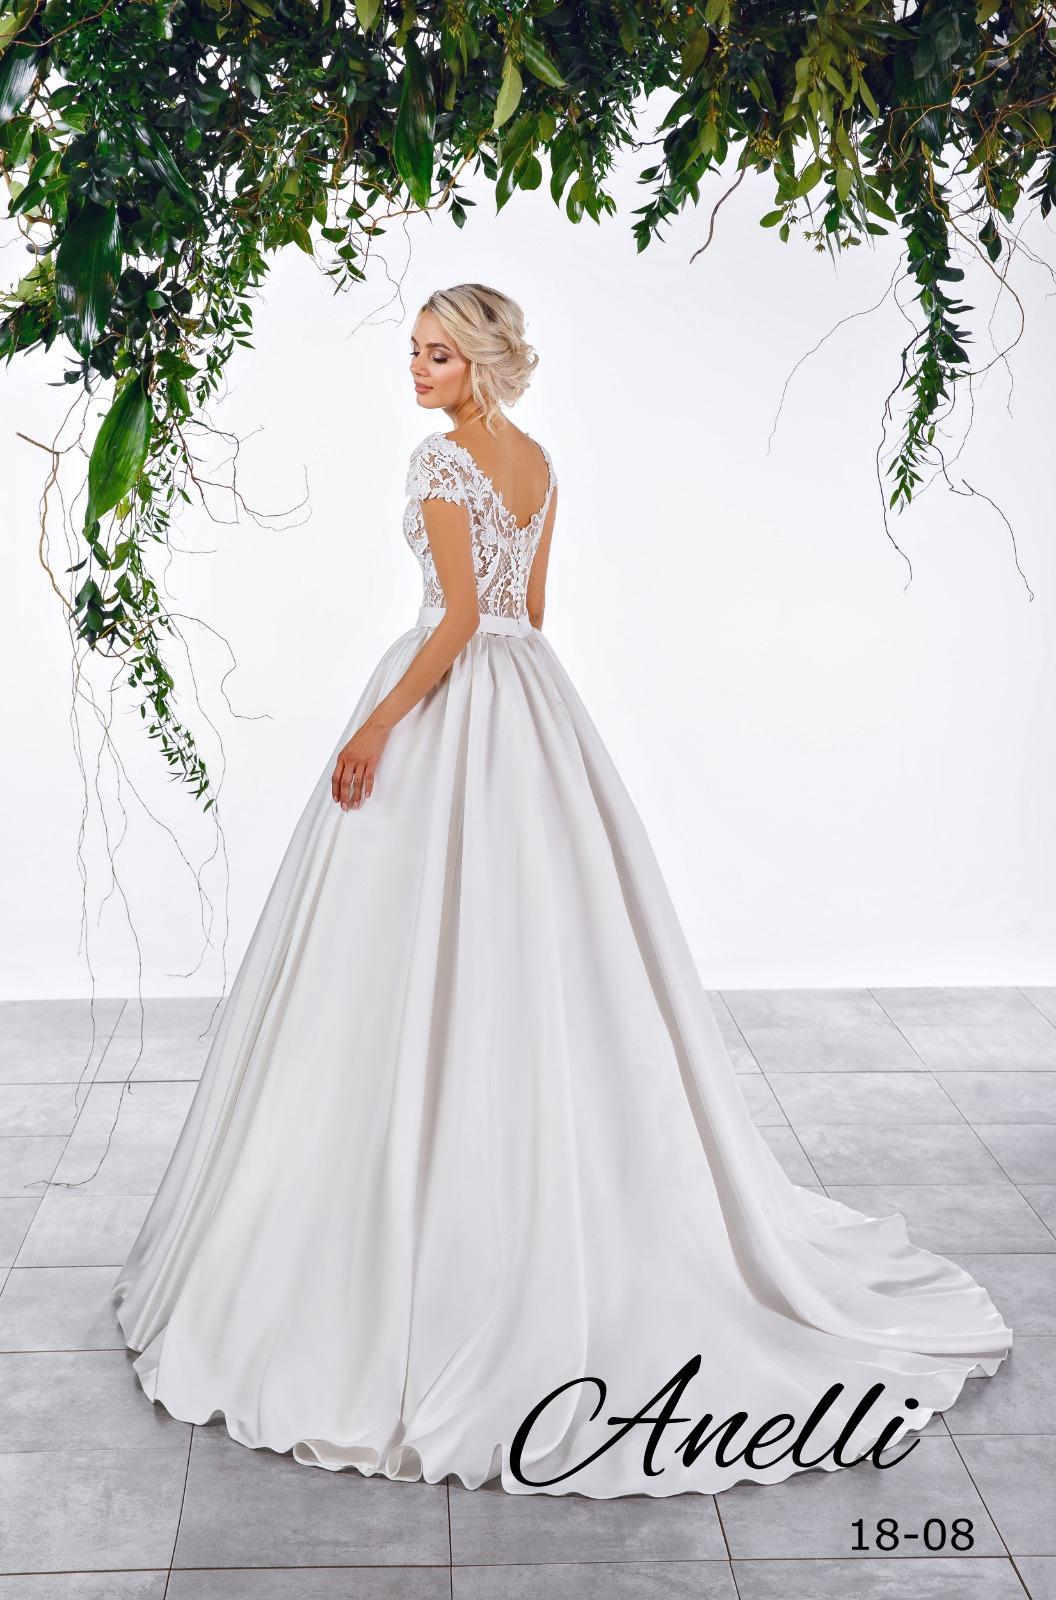 Svadobné šaty - Floral 1808 - Obrázok č. 2